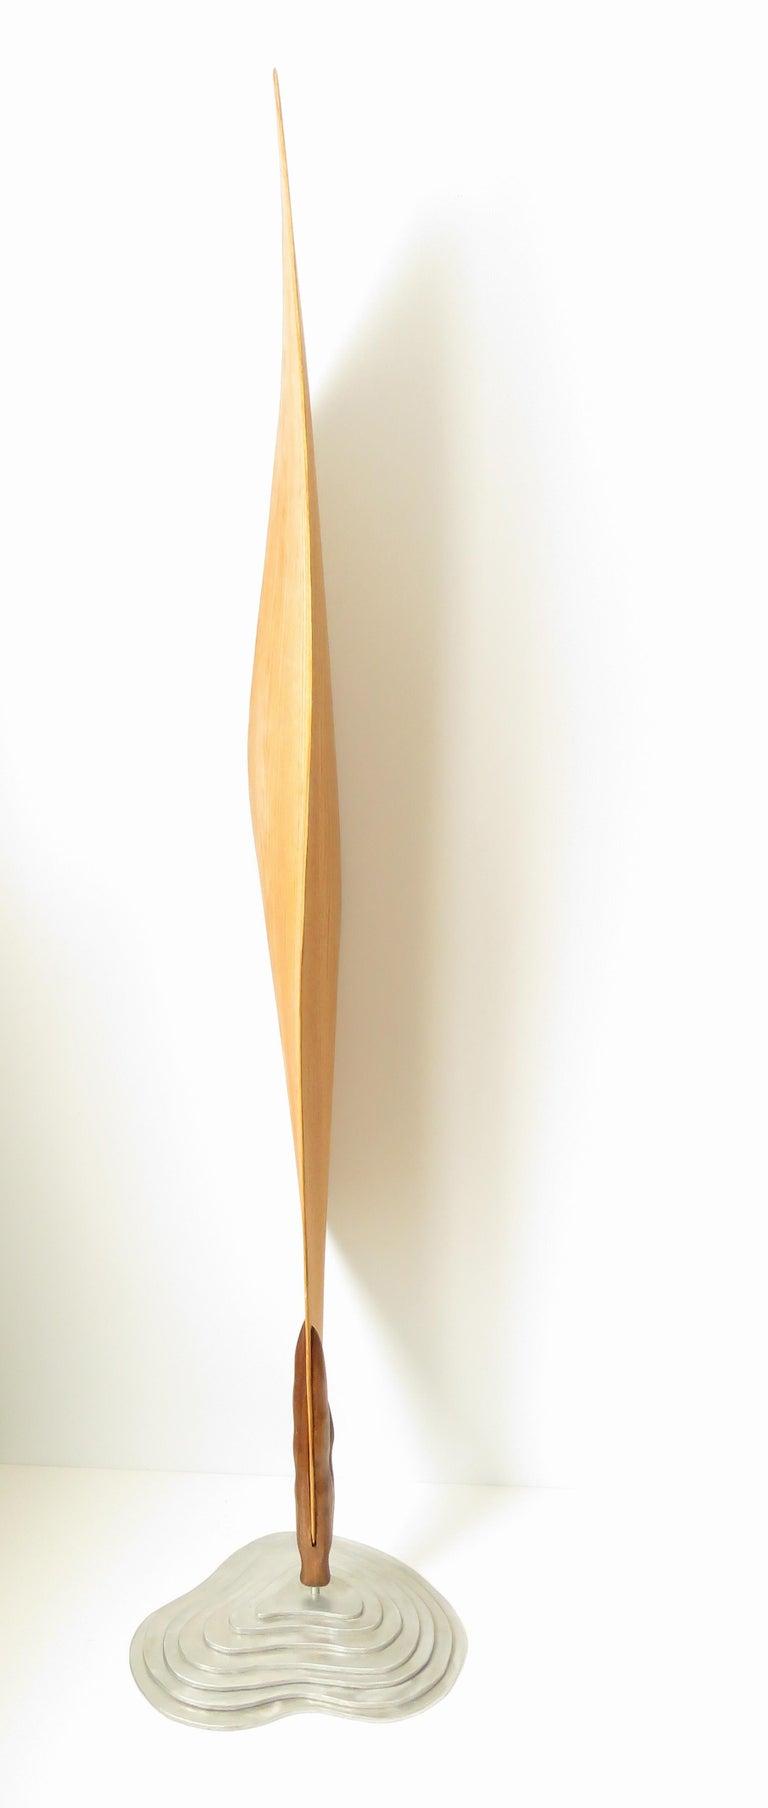 Cocoon (wood red oak bird abstract art zen sculpture pedestal minimal pea pod) - Minimalist Sculpture by Eric Tardif